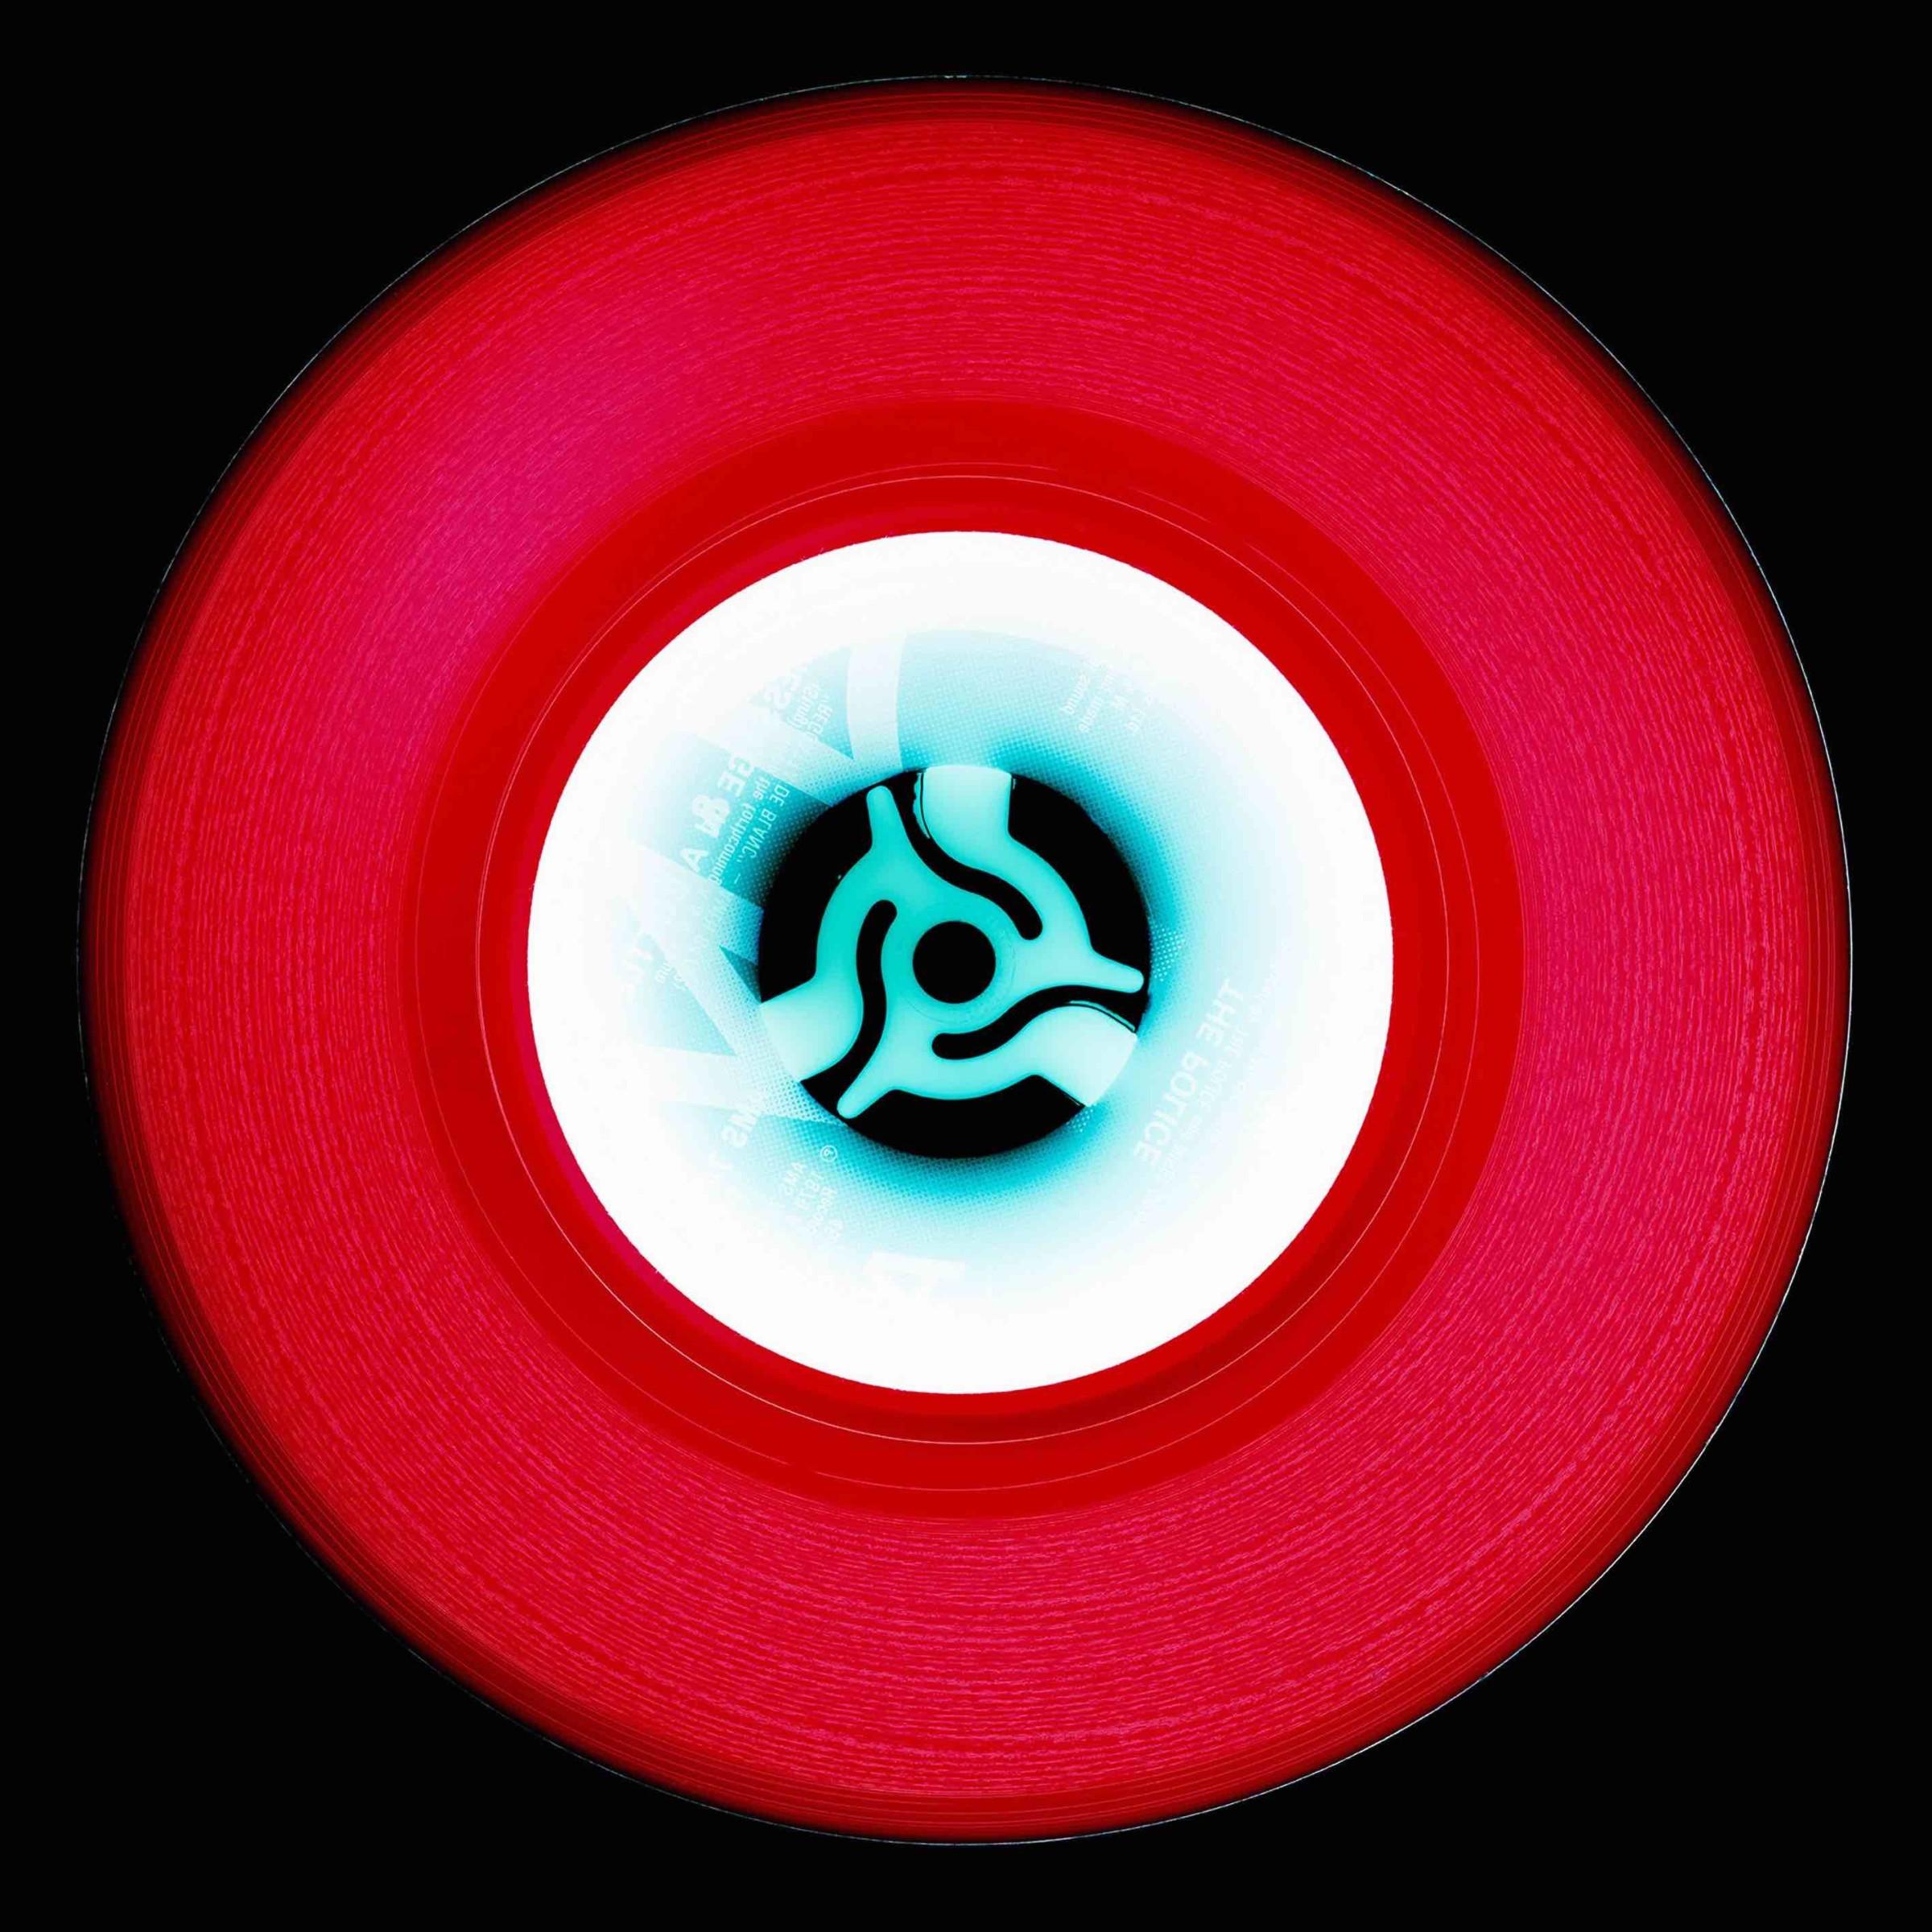 "<span class=""link fancybox-details-link""><a href=""/artists/183-heidler-%26-heeps/works/2670-heidler-heeps-a-cherry-red/"">View Detail Page</a></span><div class=""artist""><strong>Heidler & Heeps</strong></div> <div class=""title""><em>A (Cherry Red)</em></div> <div class=""medium"">C-Type Print (framed)</div> <div class=""dimensions"">32.5 x 32.5 cm </div> <div class=""edition_details"">Edition of 50</div><div class=""price"">£150.00</div><div class=""copyright_line"">Copyright The Artist</div>"